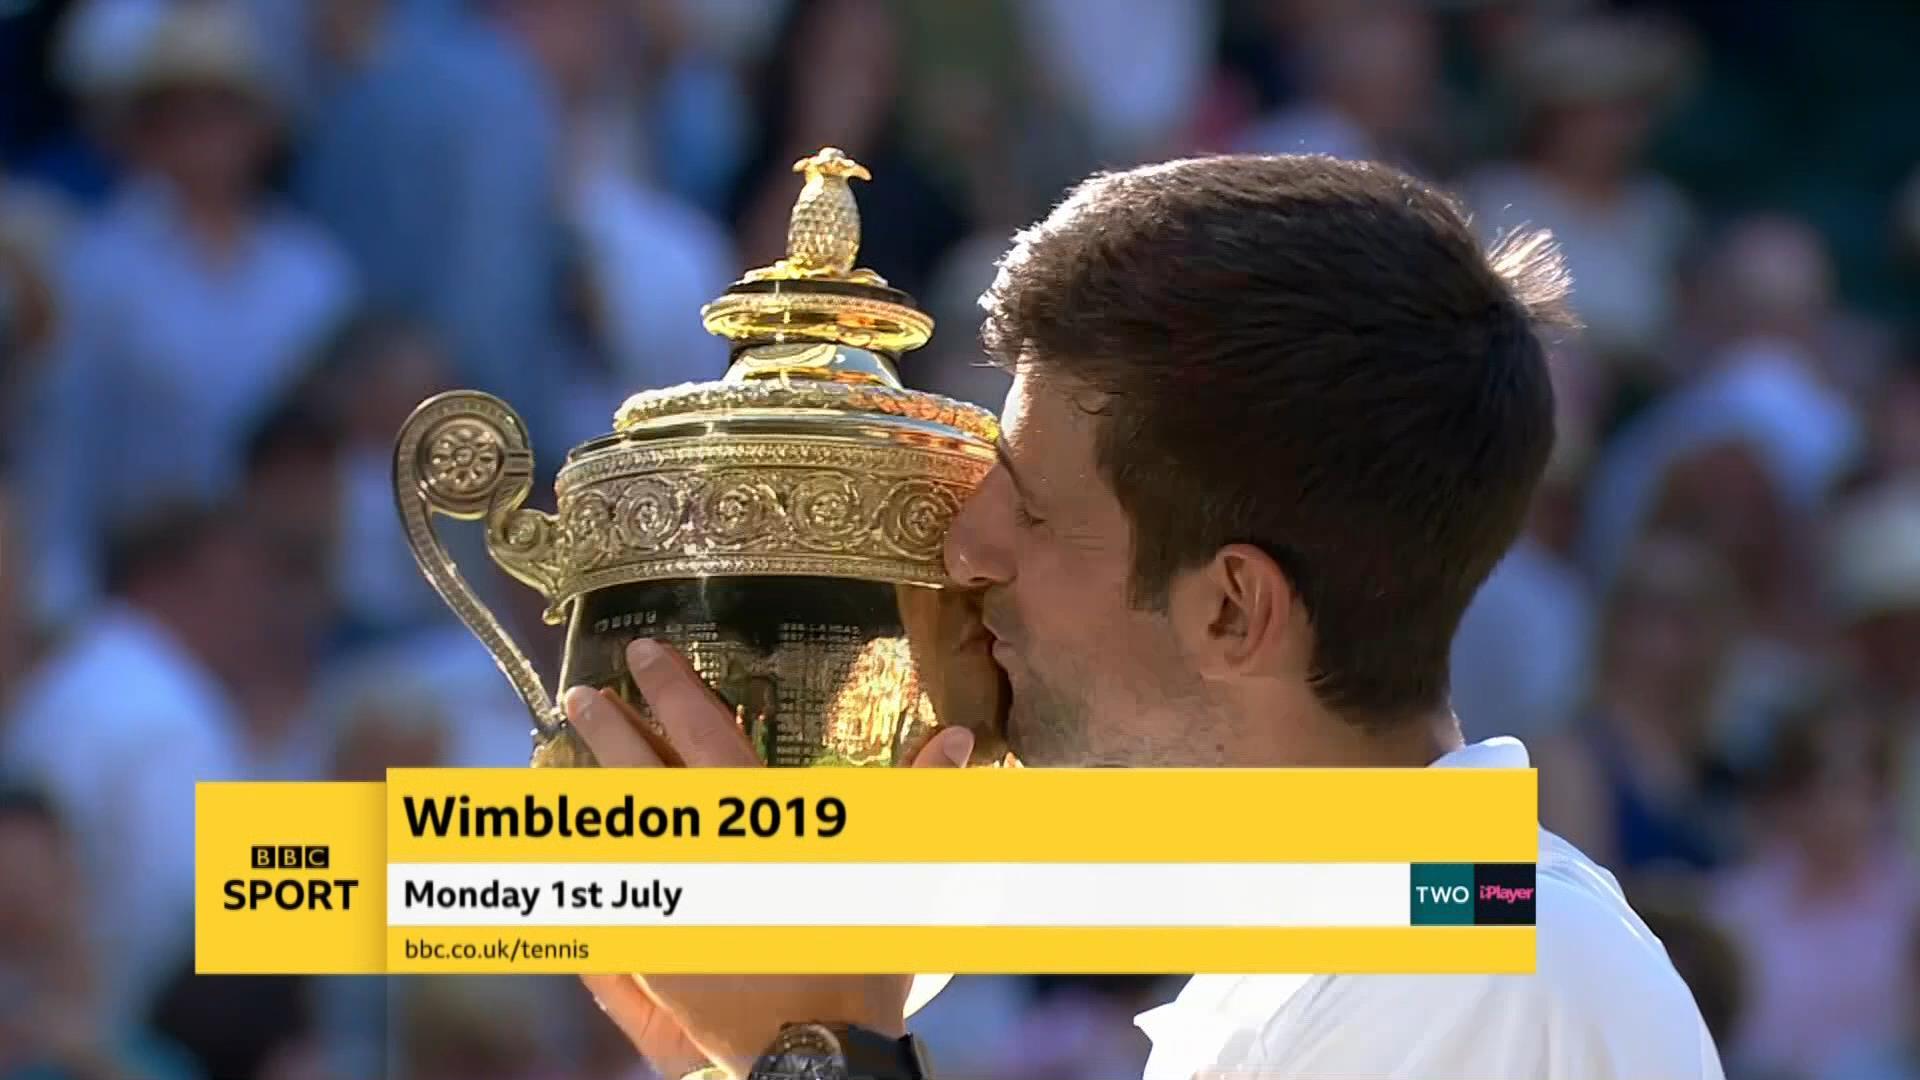 Wimbledon 2019 – Live TV Coverage on the BBC